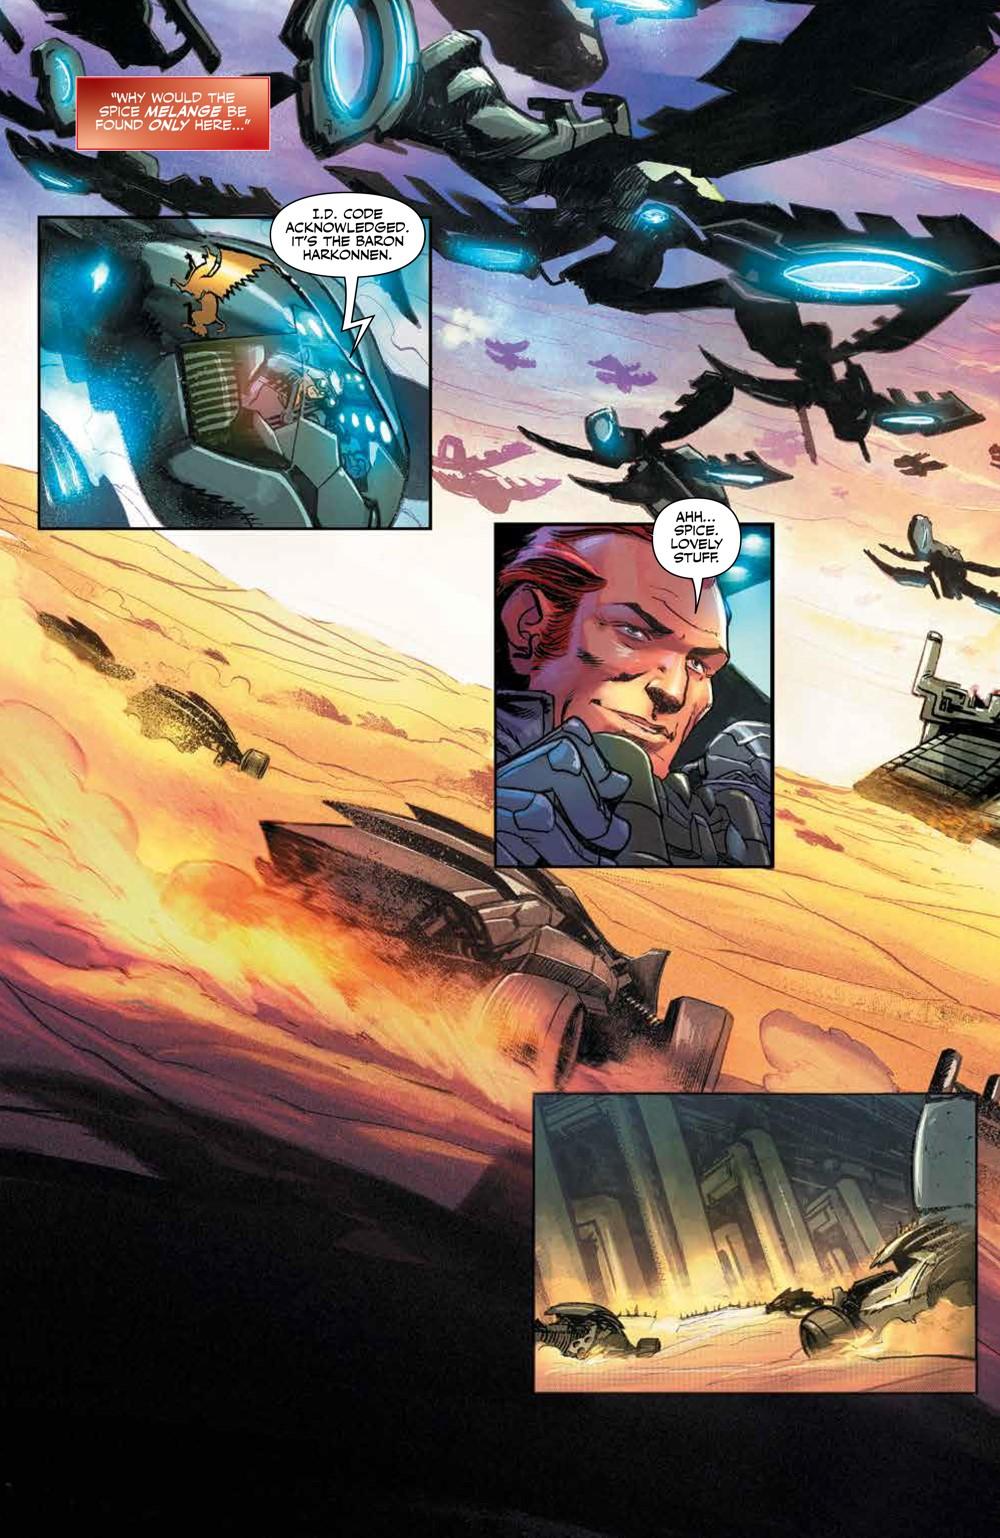 Dune_HouseAtreides_v1_HC_PRESS_8 ComicList Previews: DUNE HOUSE ATREIDES VOLUME 1 HC